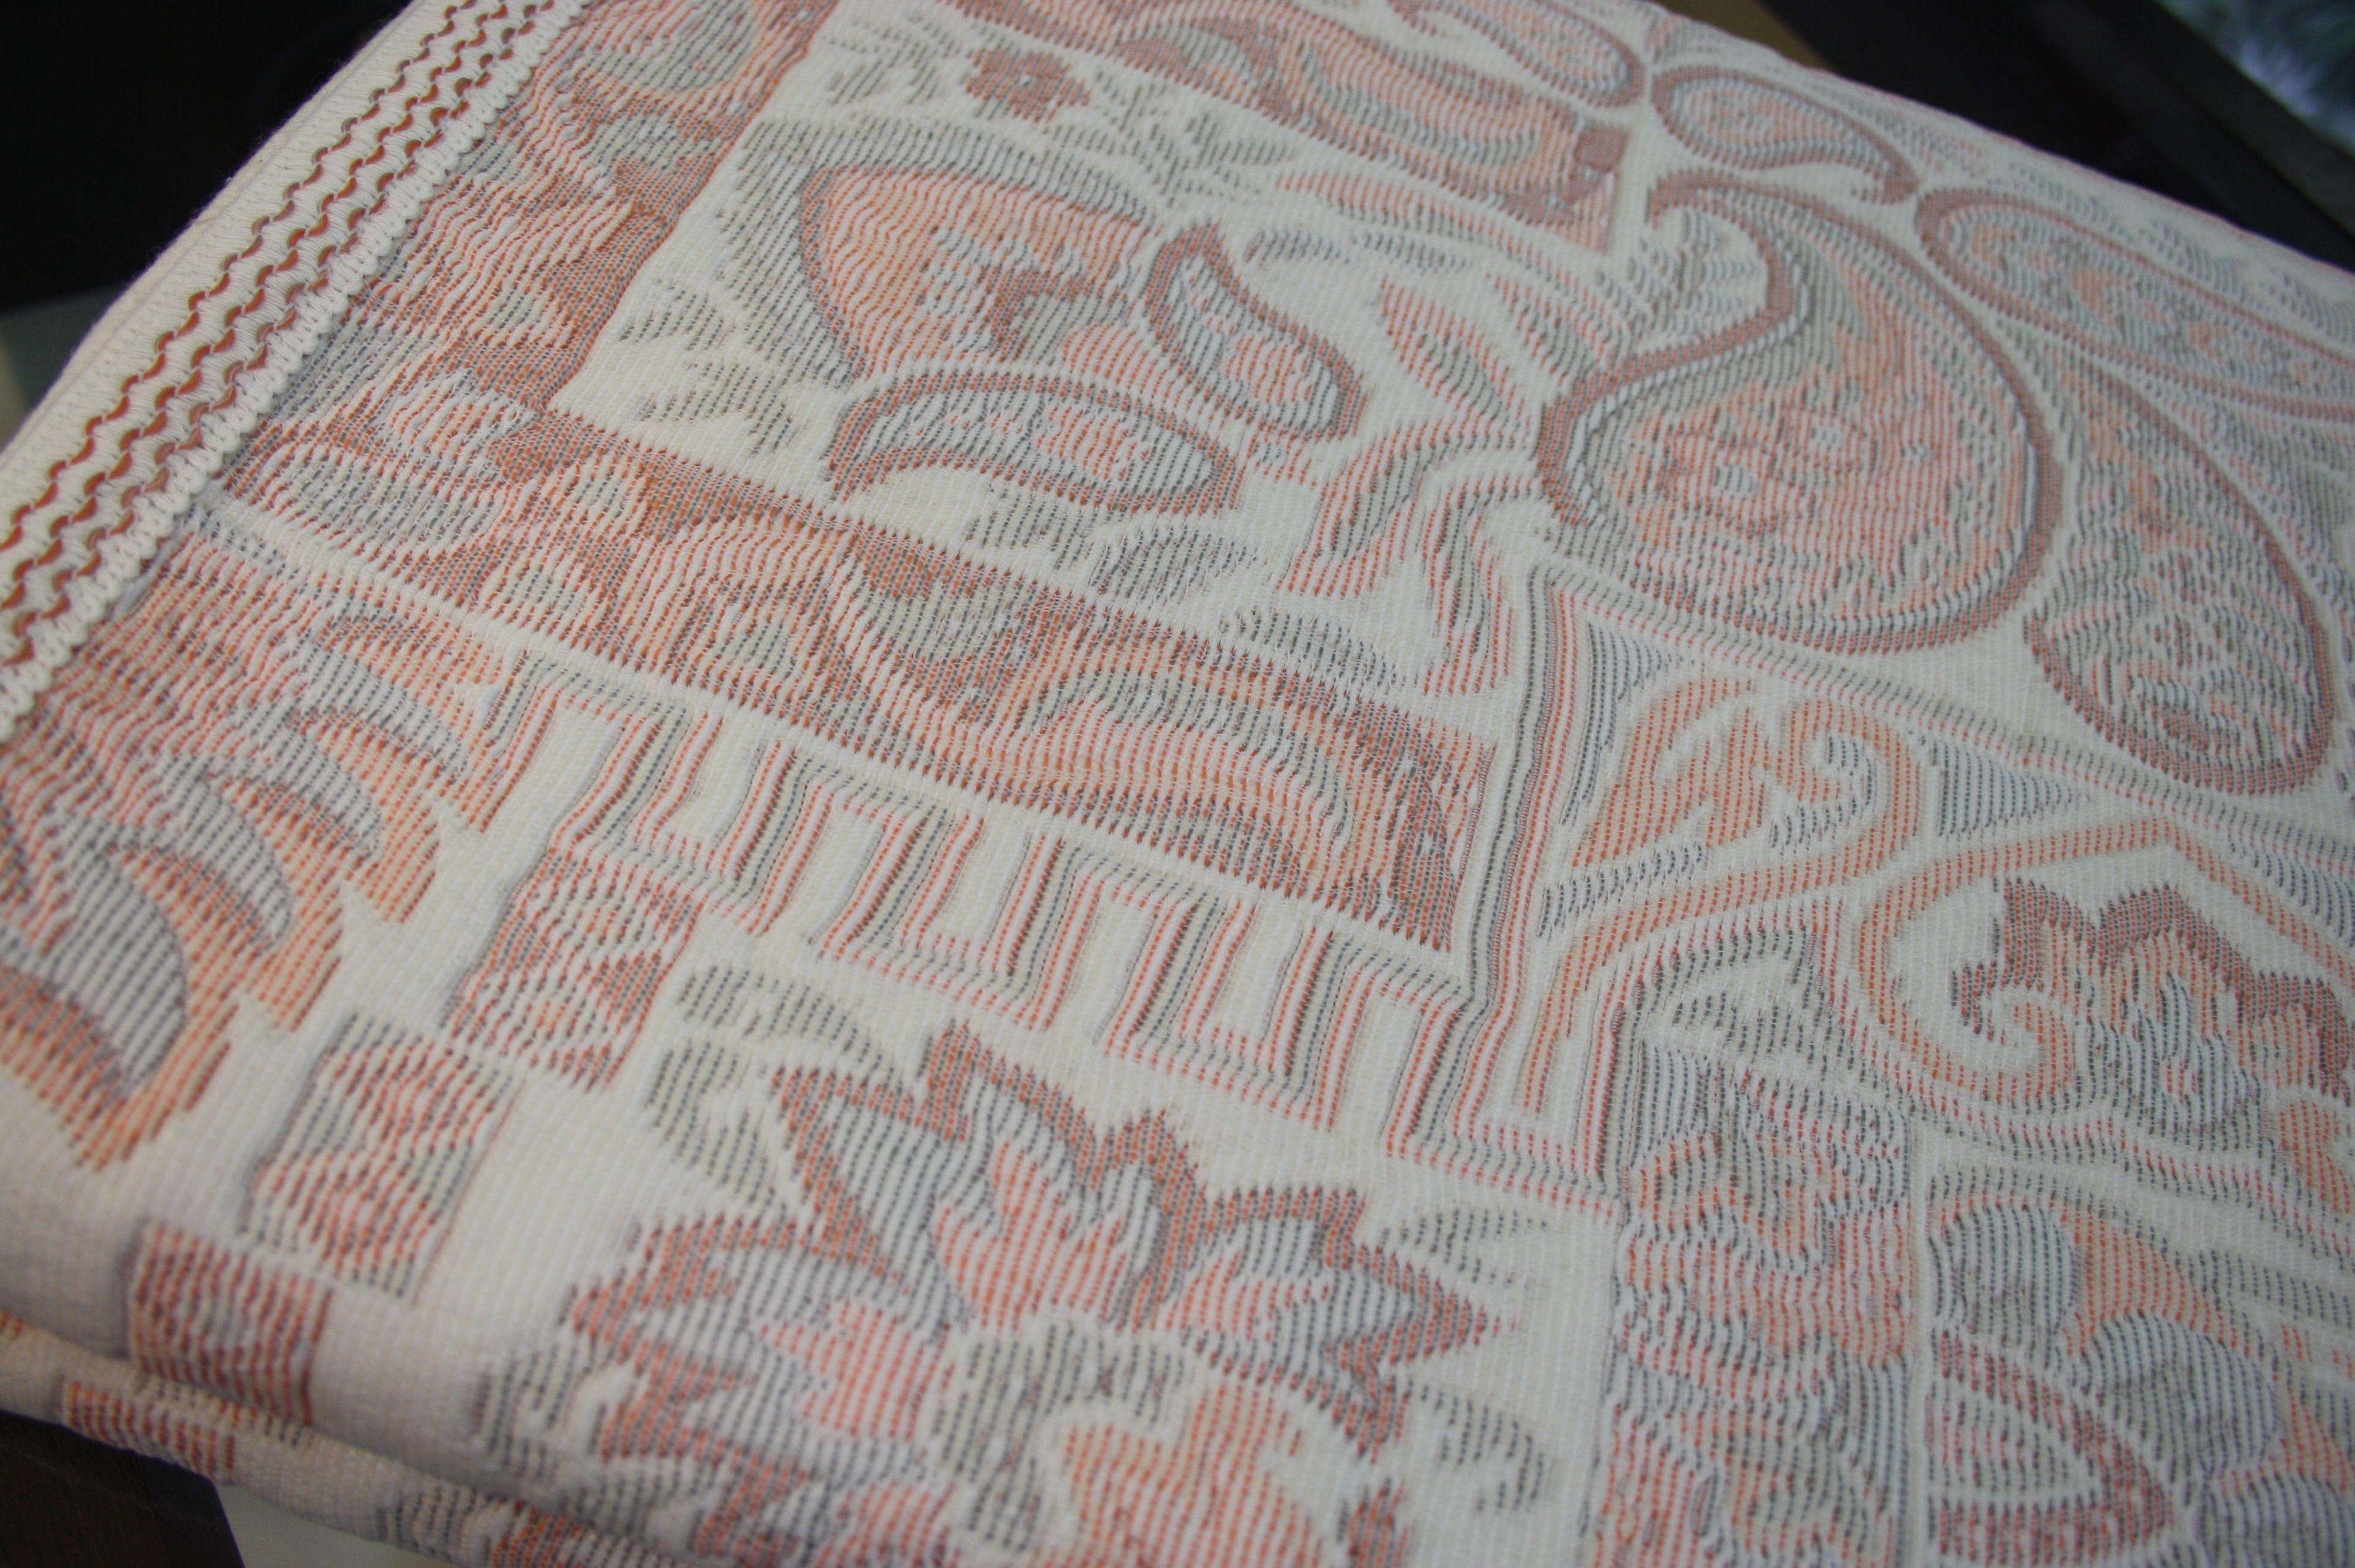 Colcha de verano cama 90 cm.: Catálogo de La Cibeles